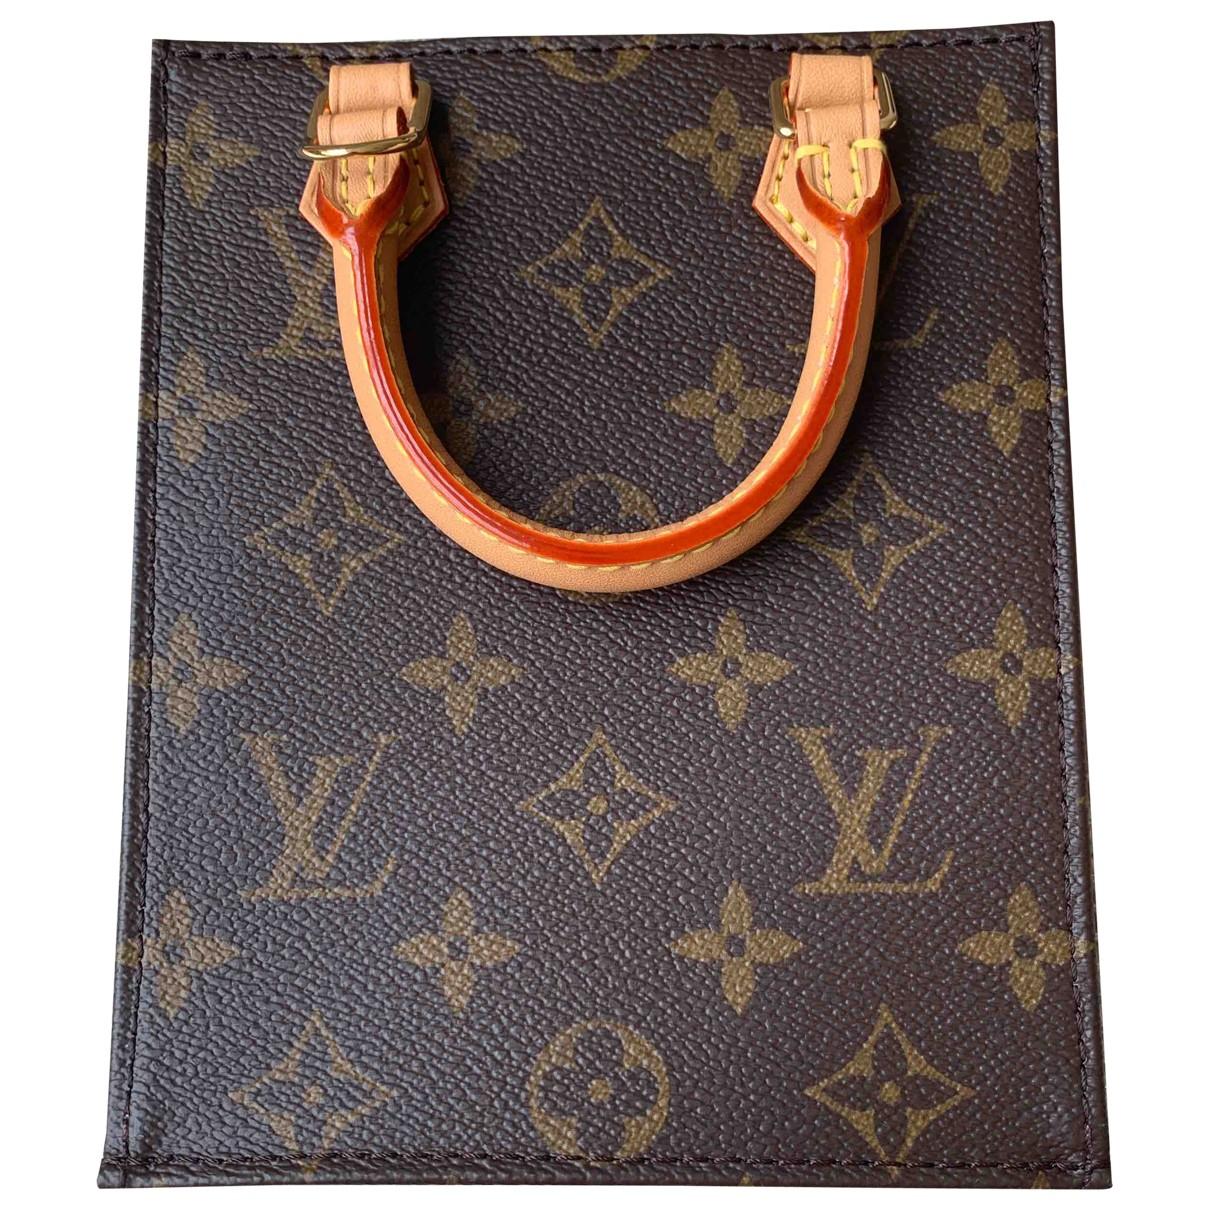 Bandolera Plat de Lona Louis Vuitton